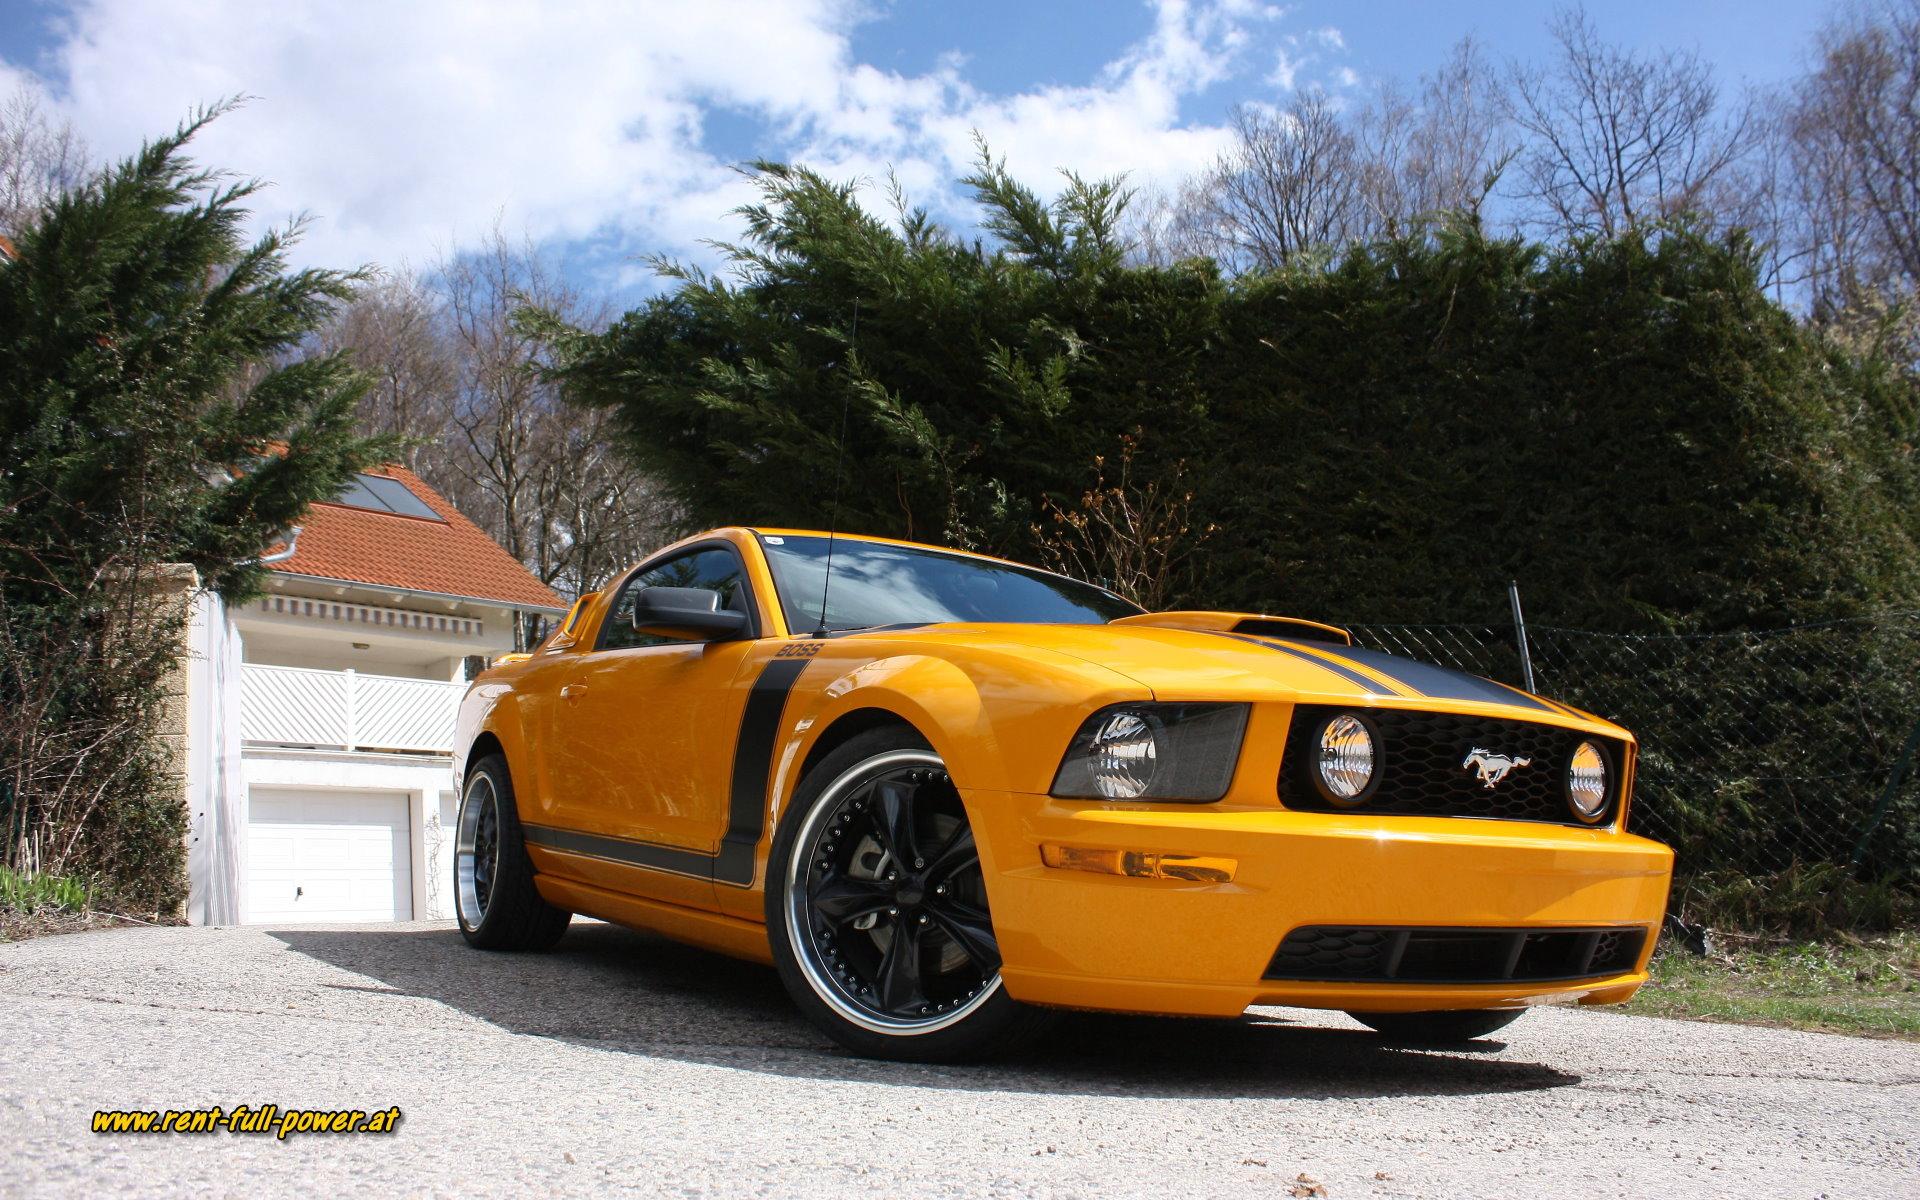 Ford Mustang Gt Boss Wallpaper Vermietung Von Us Muscle Cars